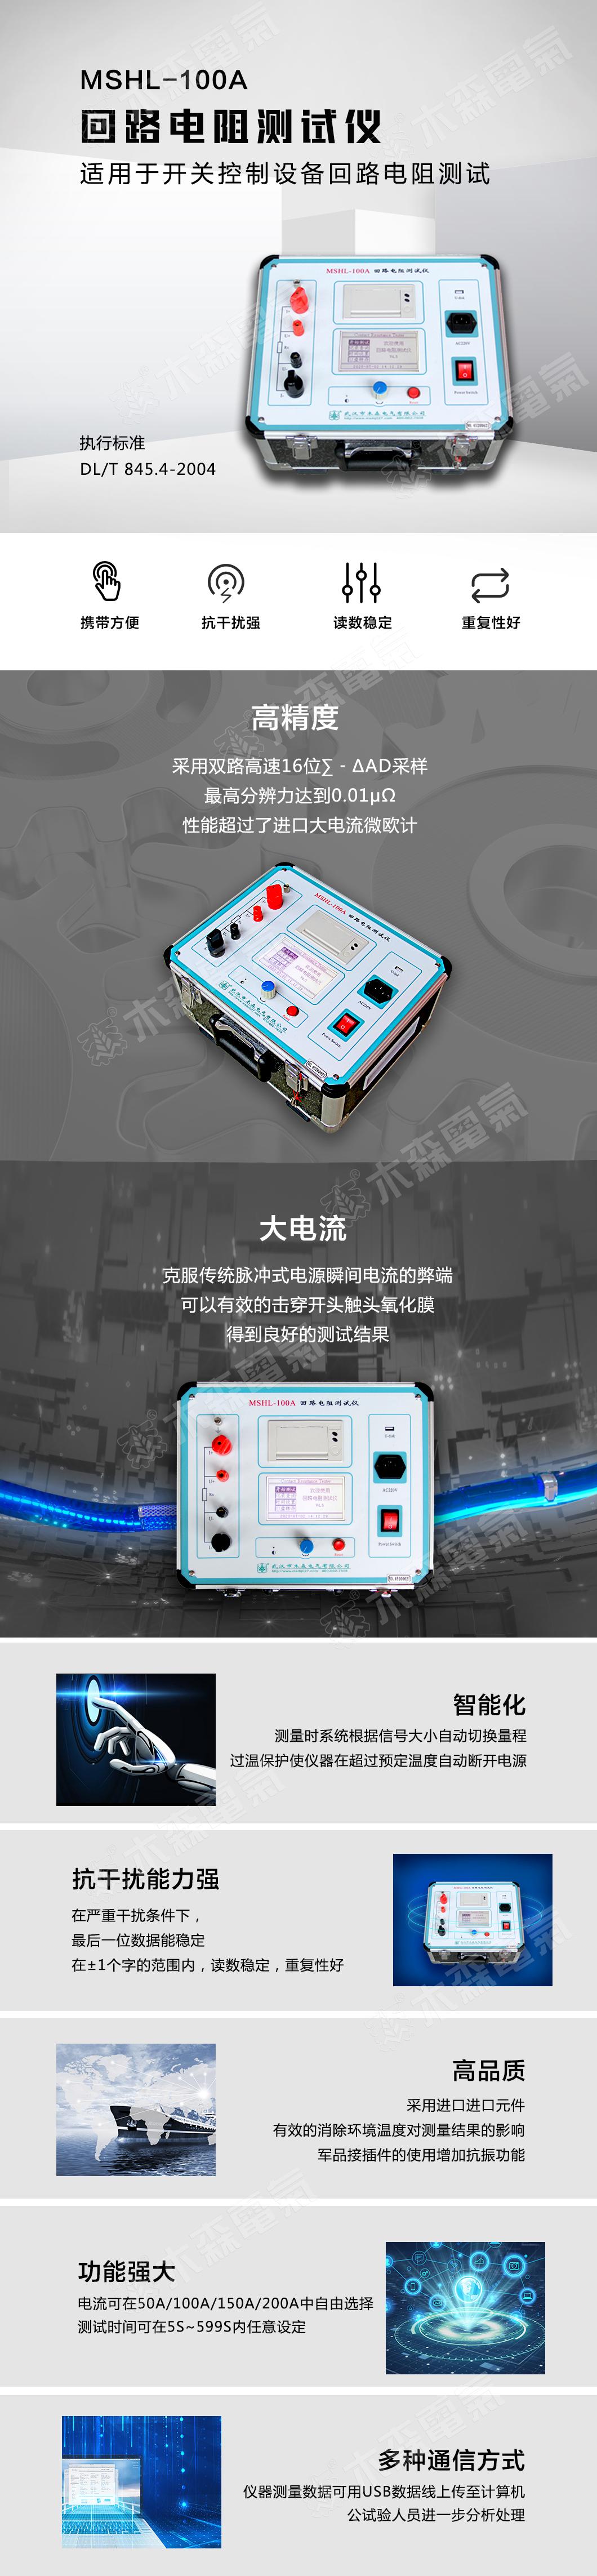 MSHL-100A回路电阻测试仪